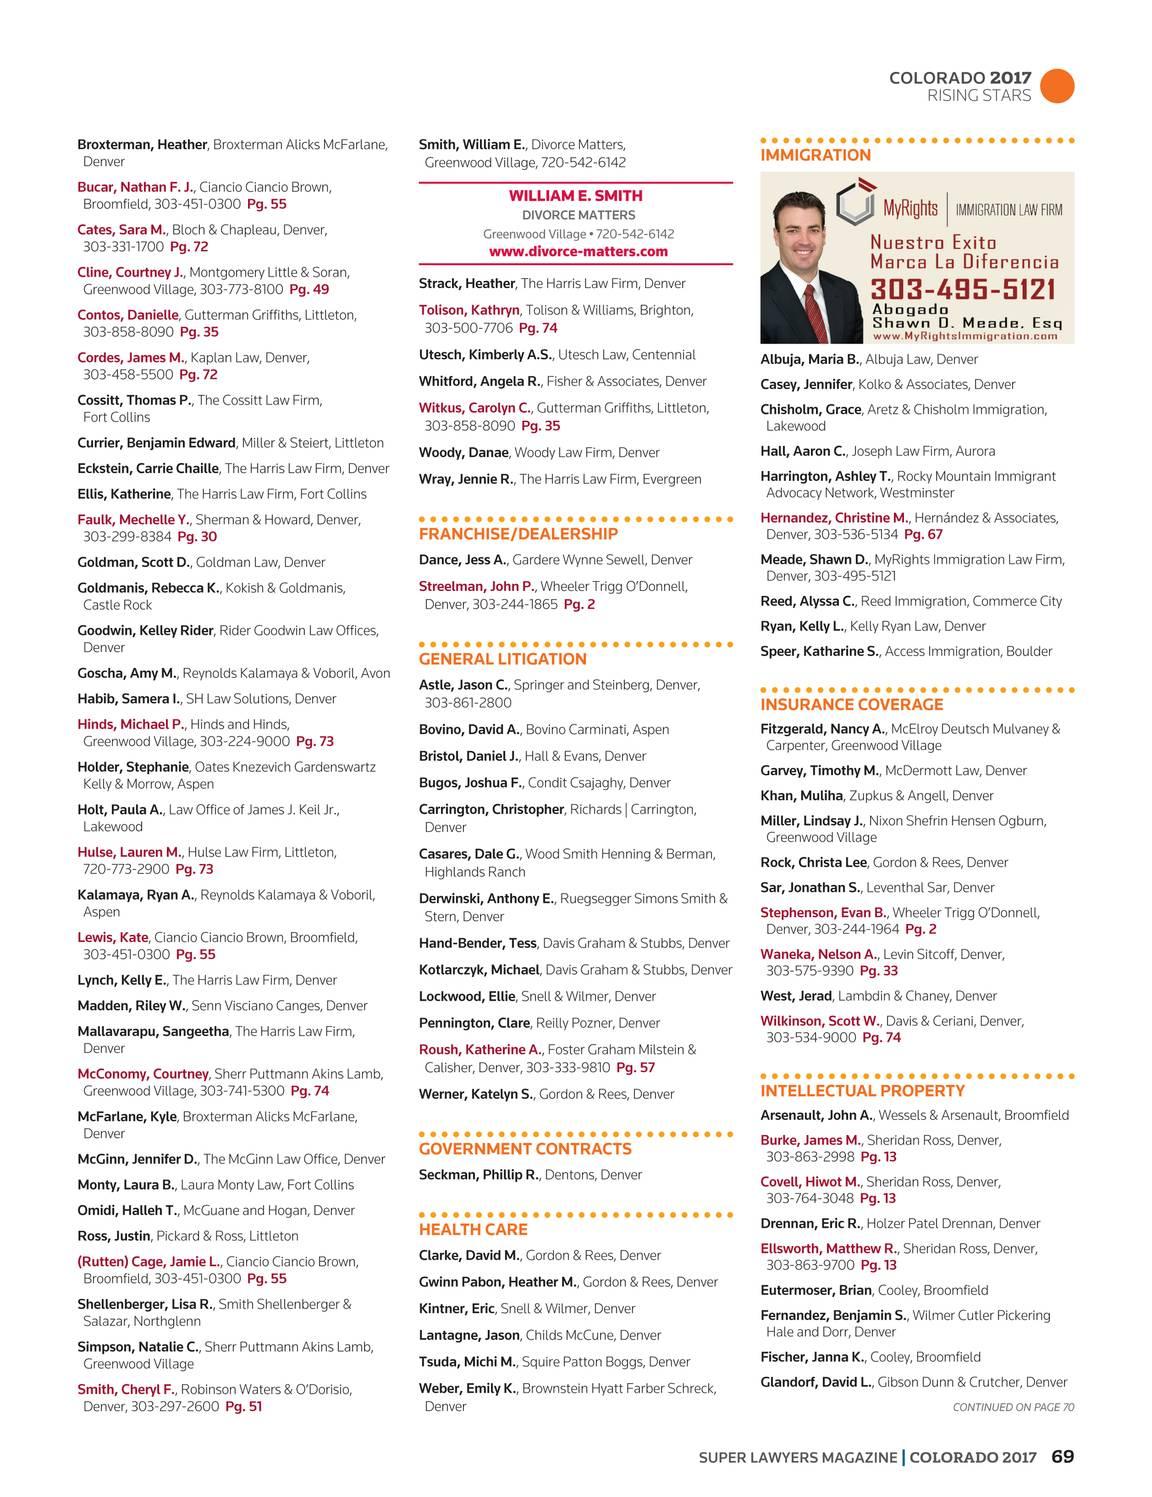 Super Lawyers Colorado 2017 Page 69